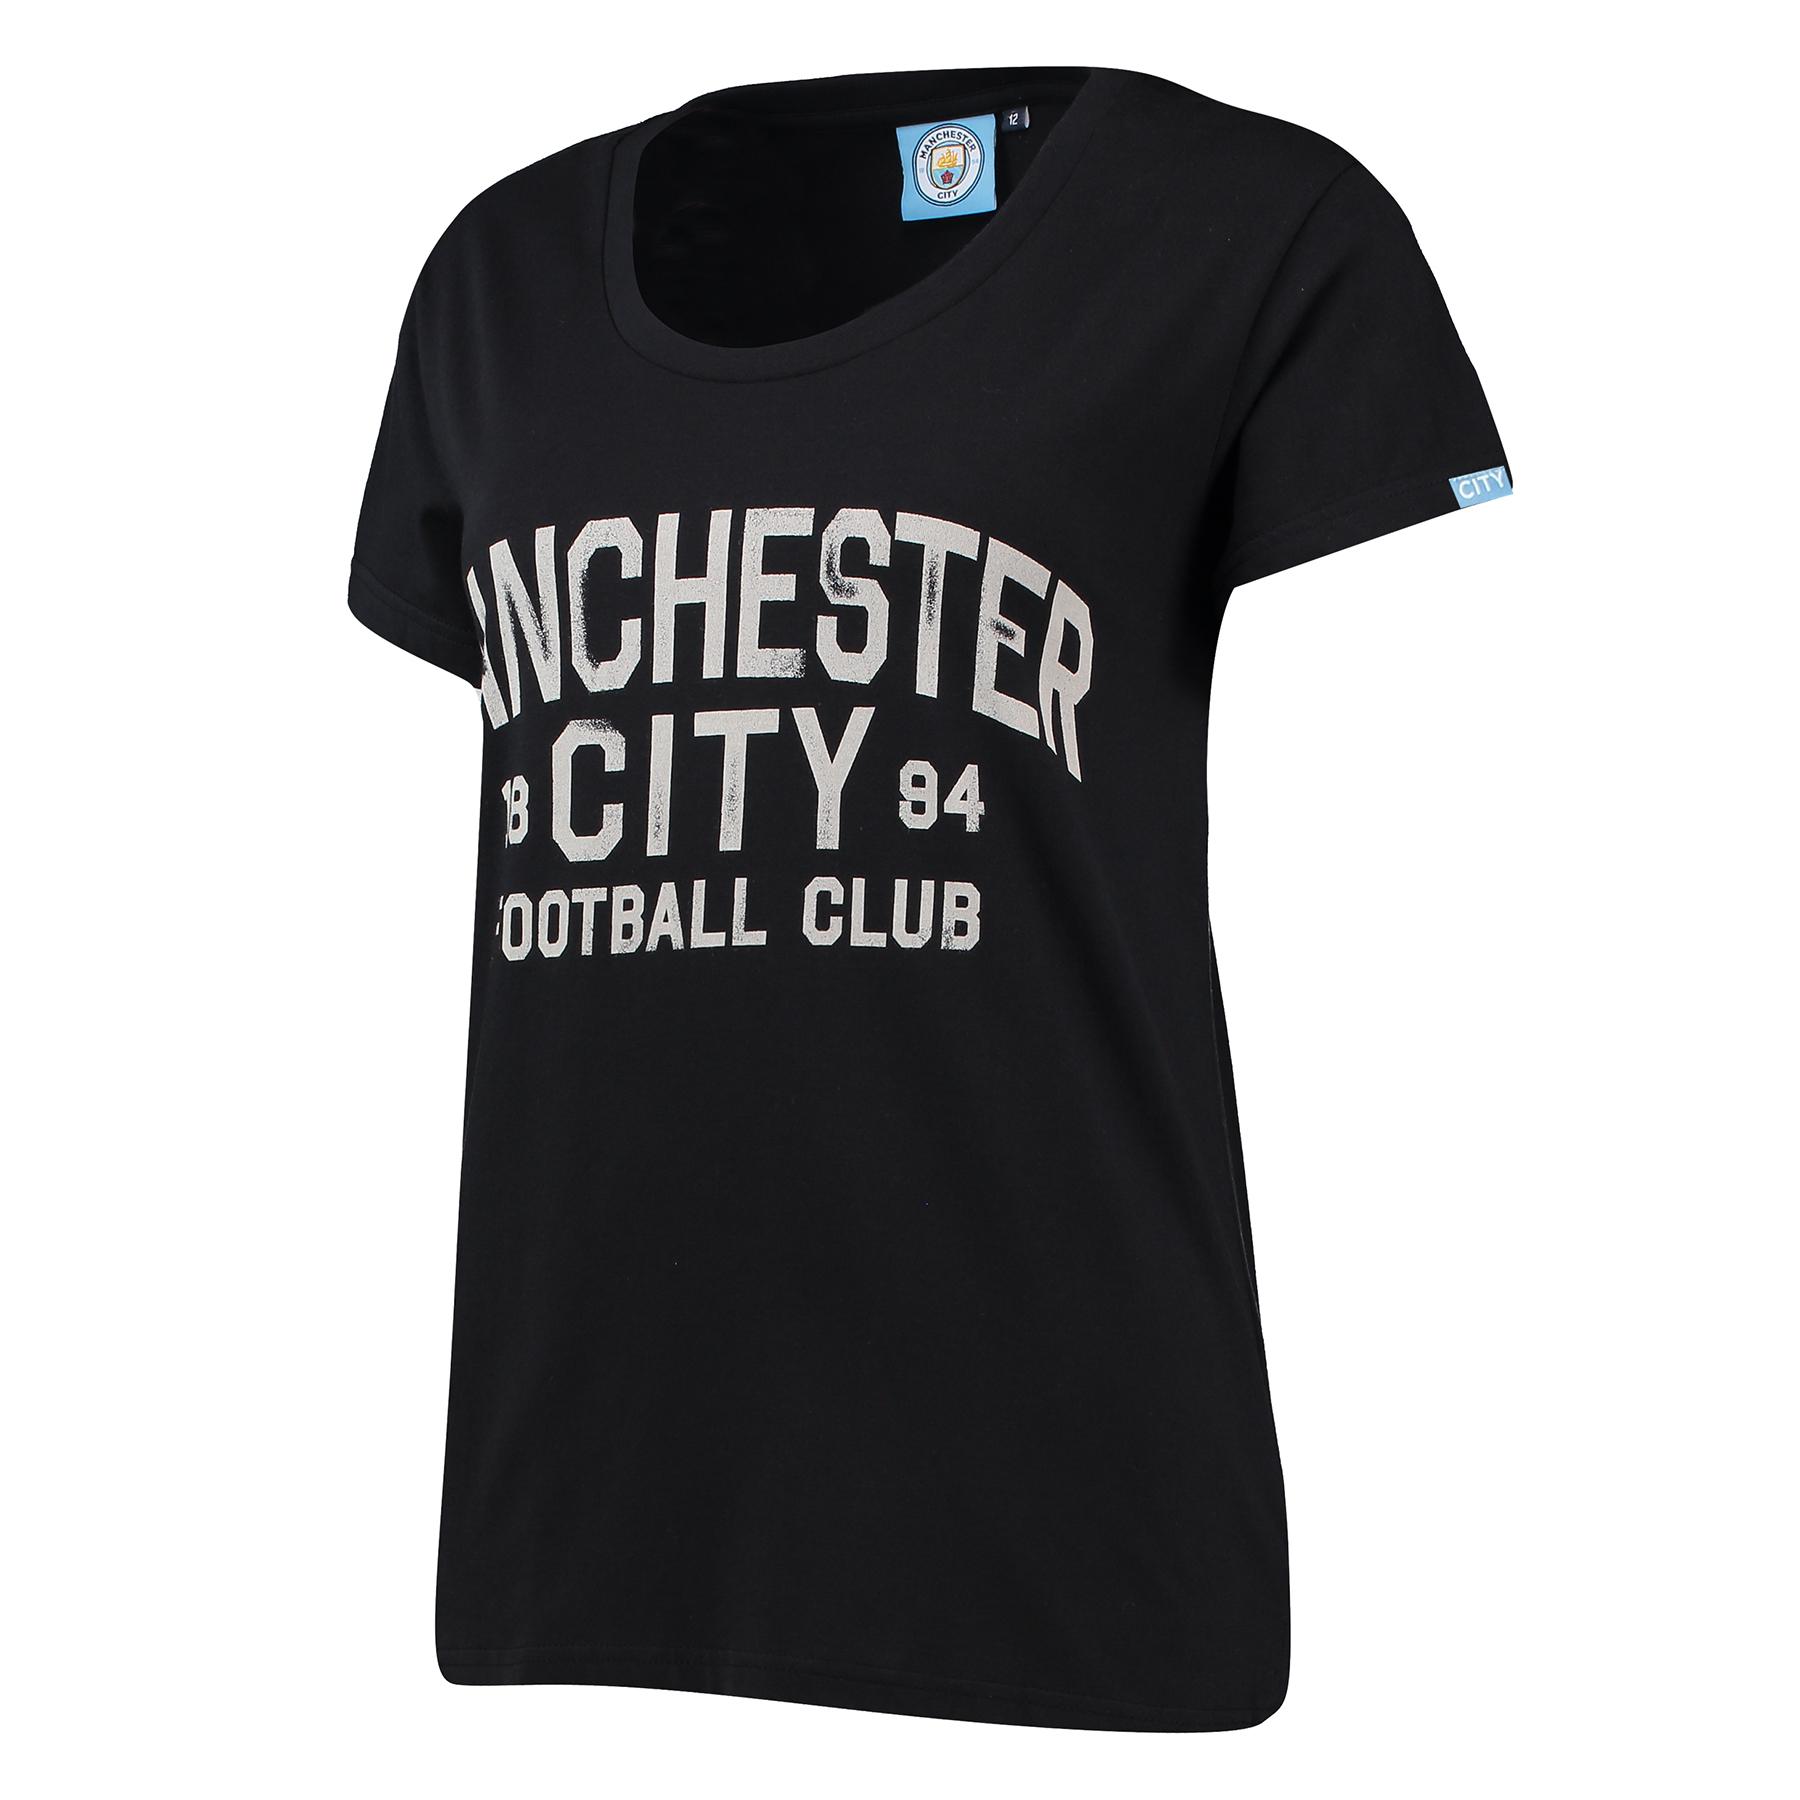 Manchester City Print T-Shirt - Black - Womens